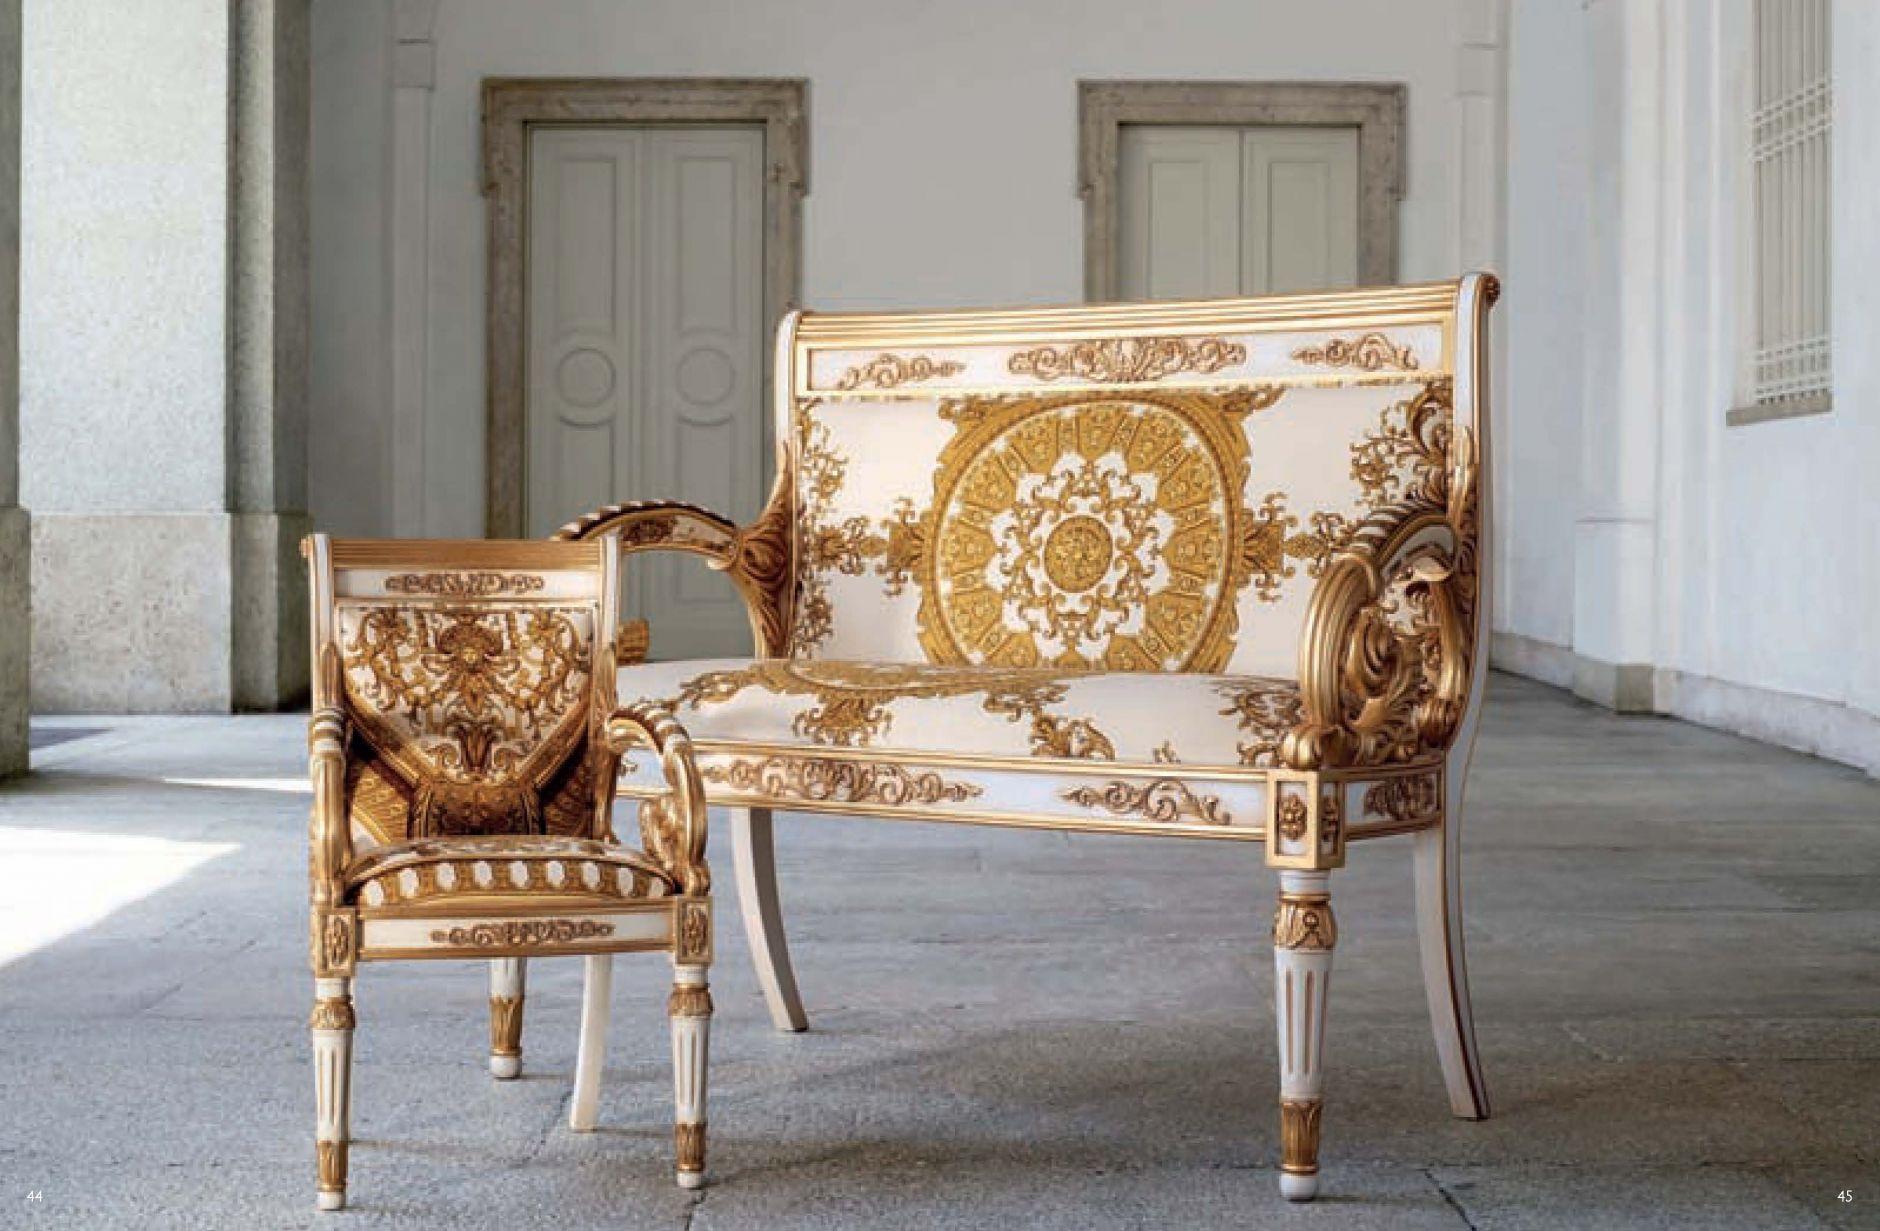 Versace Furniture Upholstered Furniture Versace Vanitas Seriesfurniture From Italy